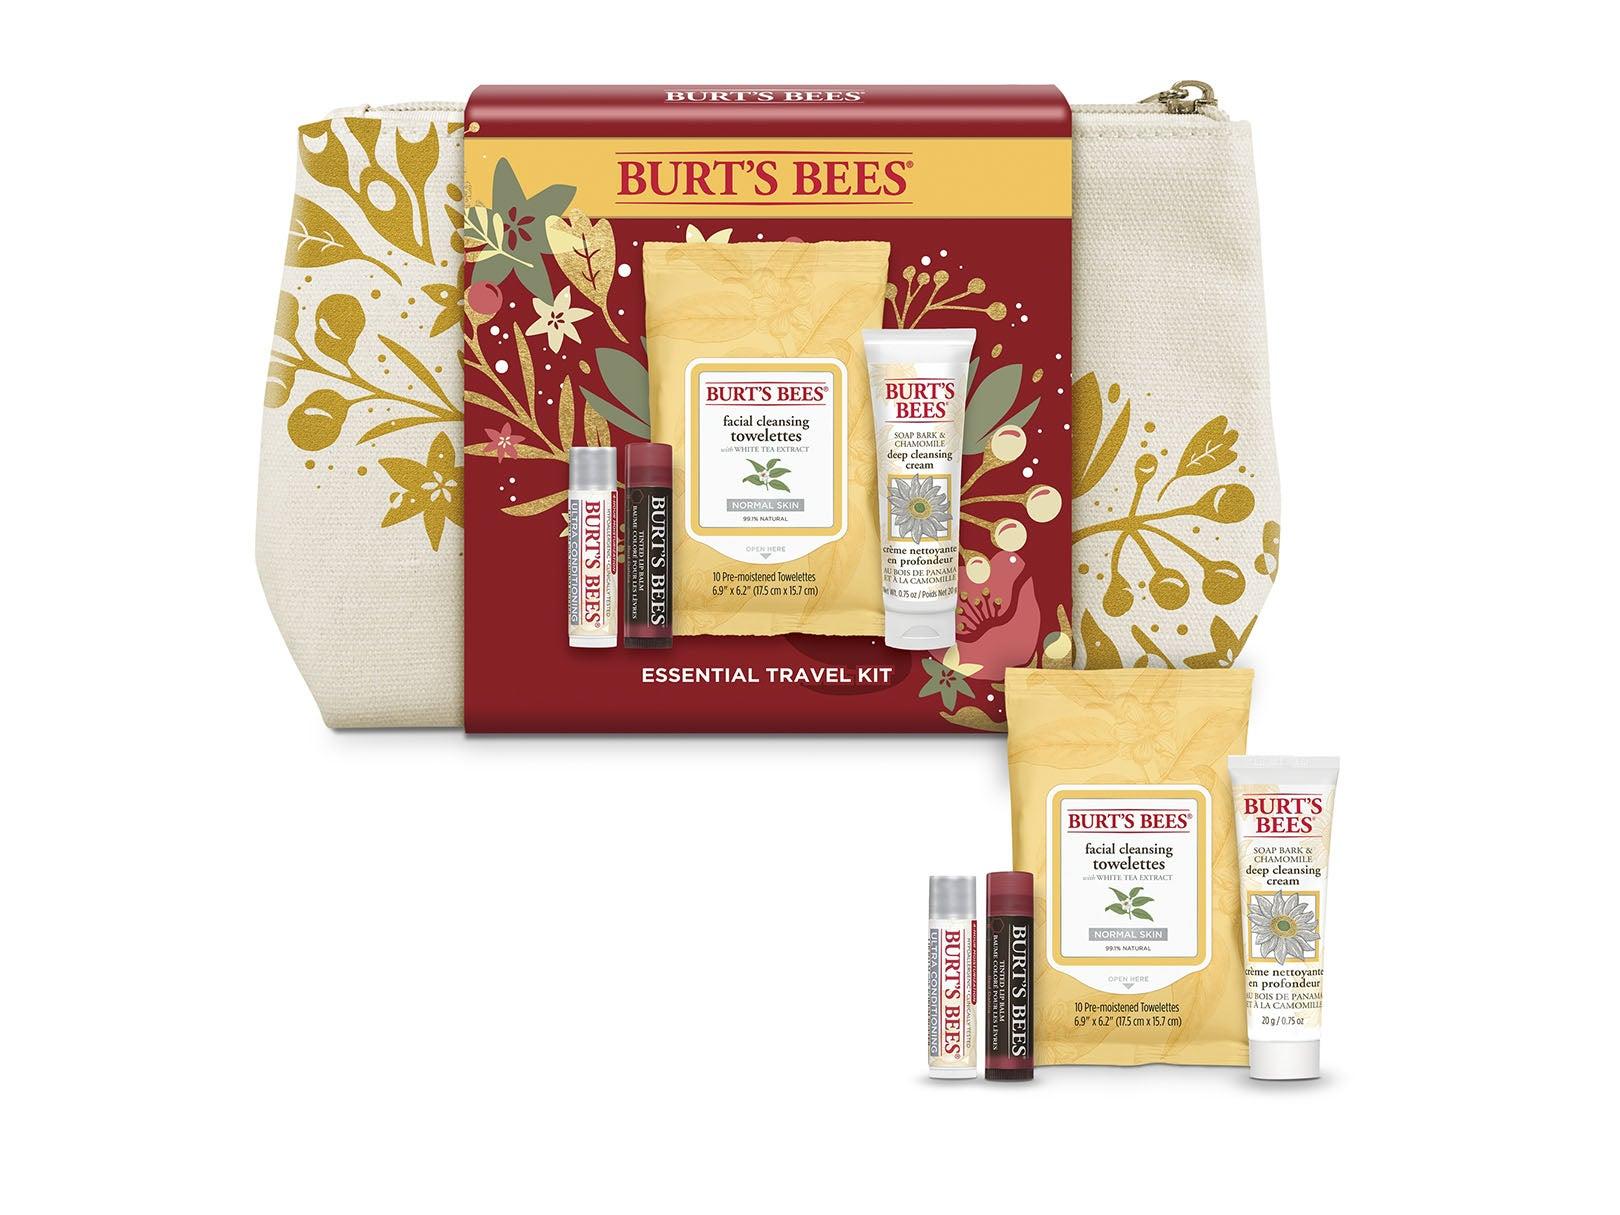 Burt's Bees Essential Travel Kit